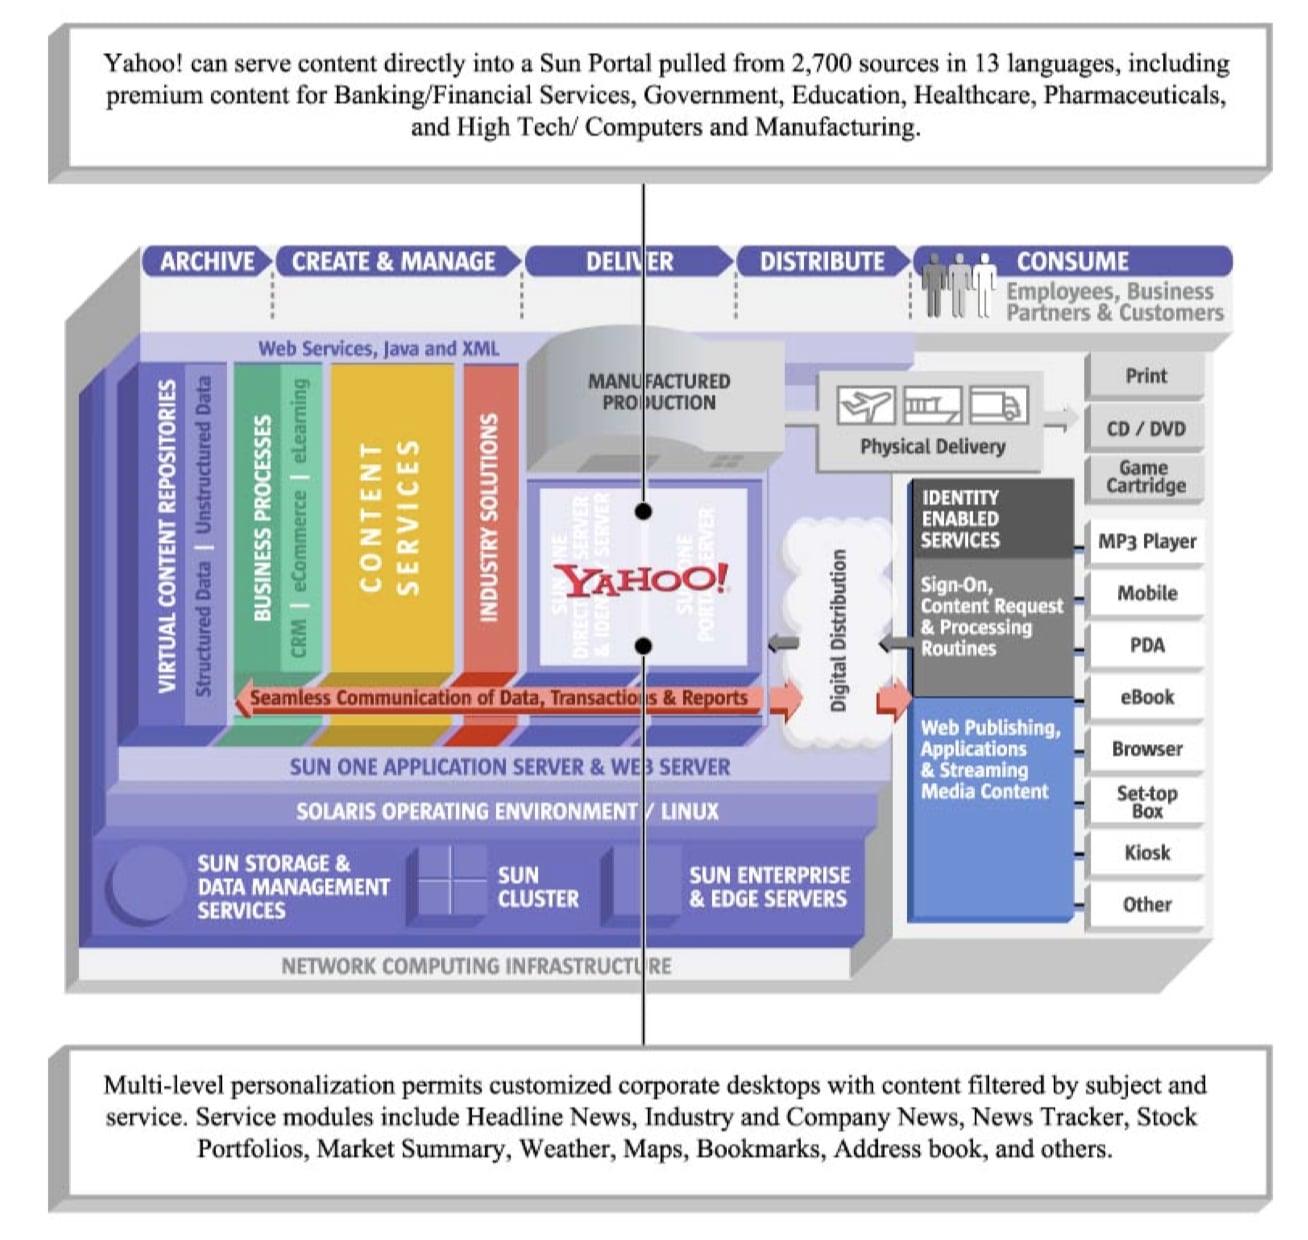 My Yahoo Enterprise portal and Sun ONE